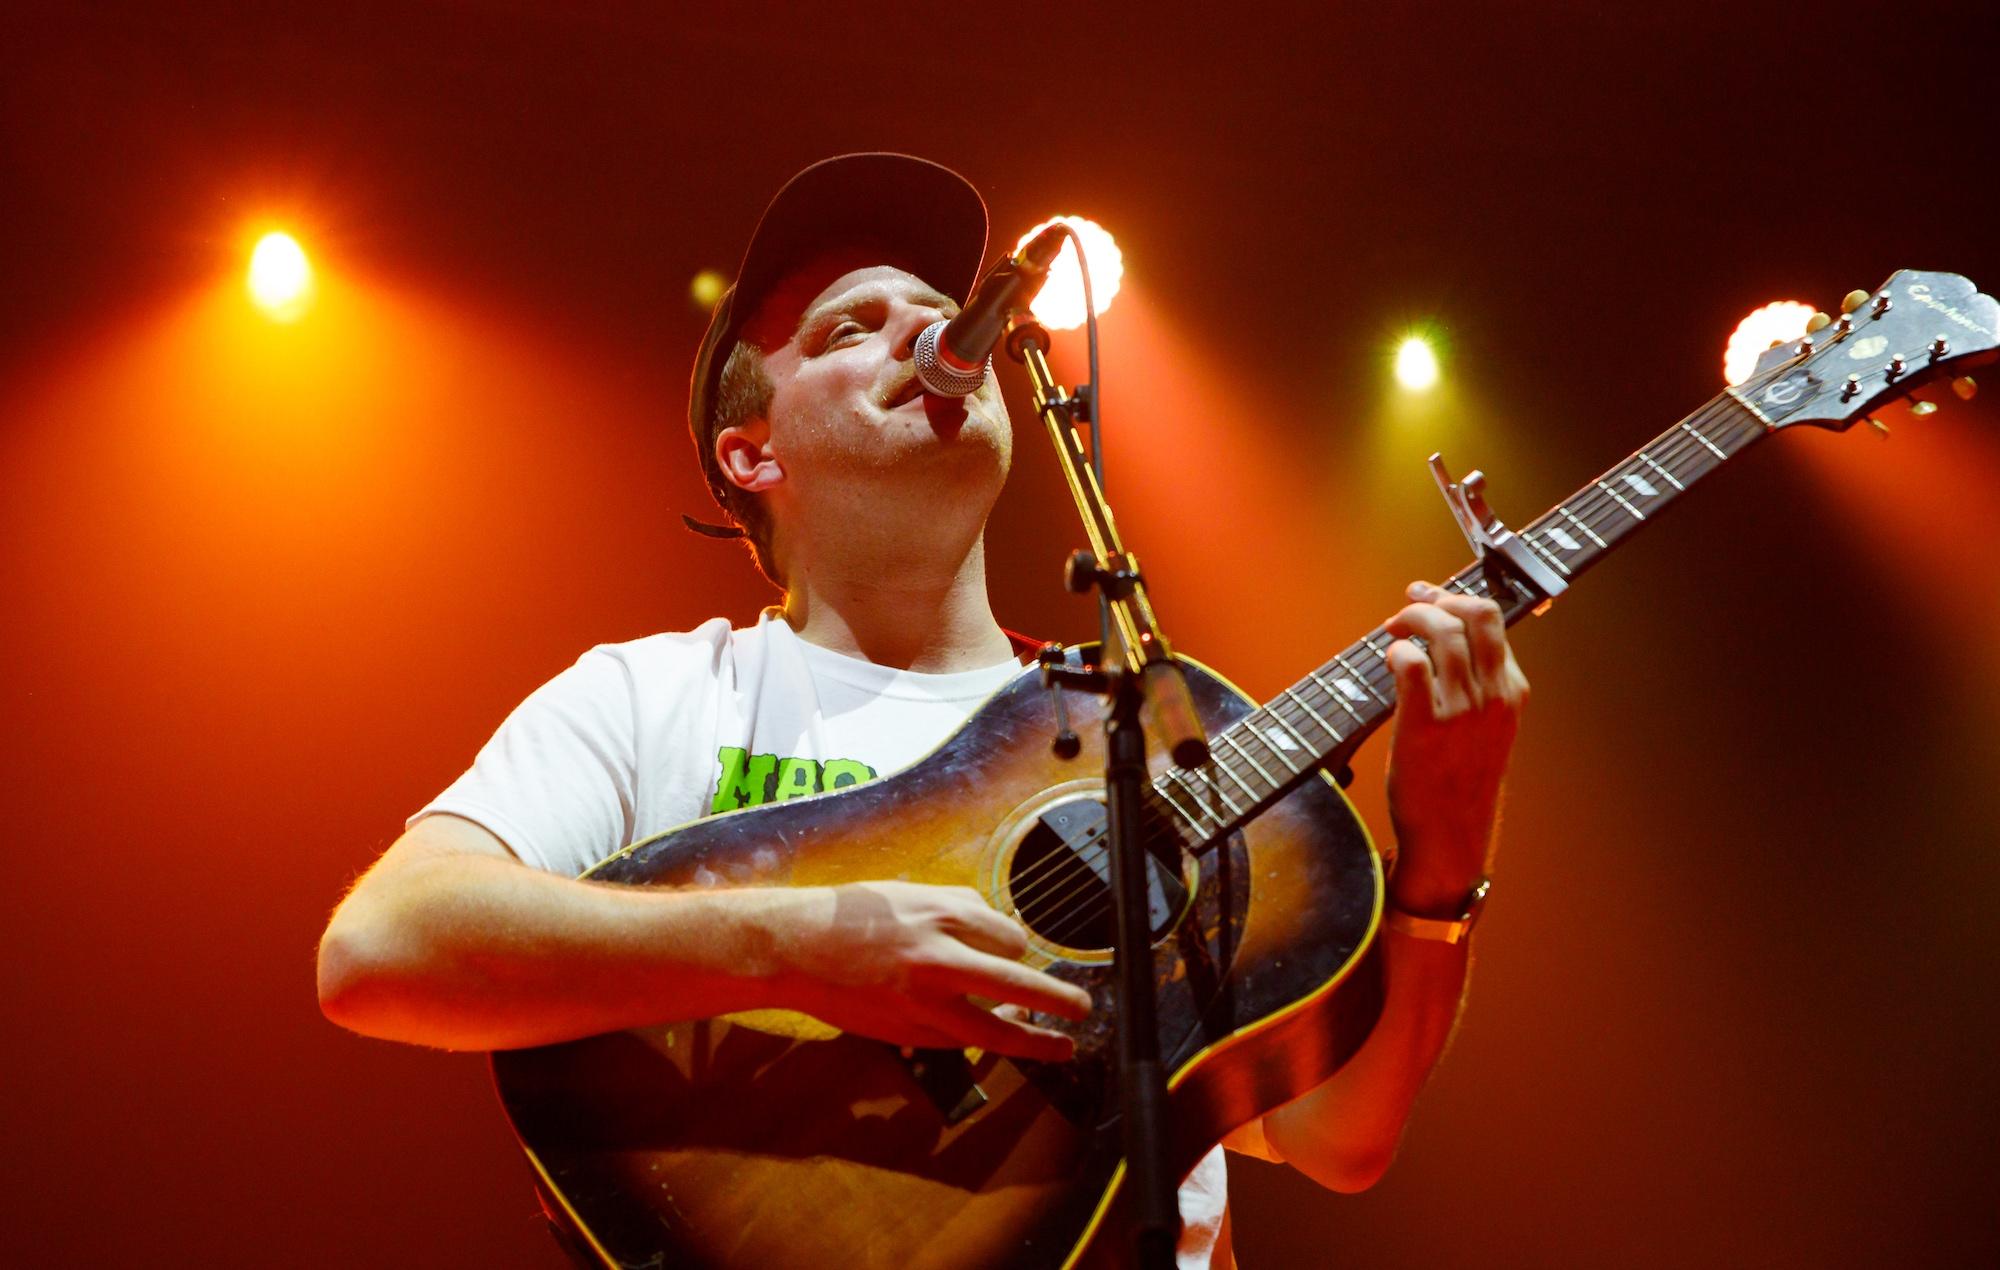 Mac Demarco Shares Here Comes The Cowboy Demos Nme Lyrics © kobalt music publishing ltd. https www nme com news music mac demarco shares here comes the cowboy demos 2739818